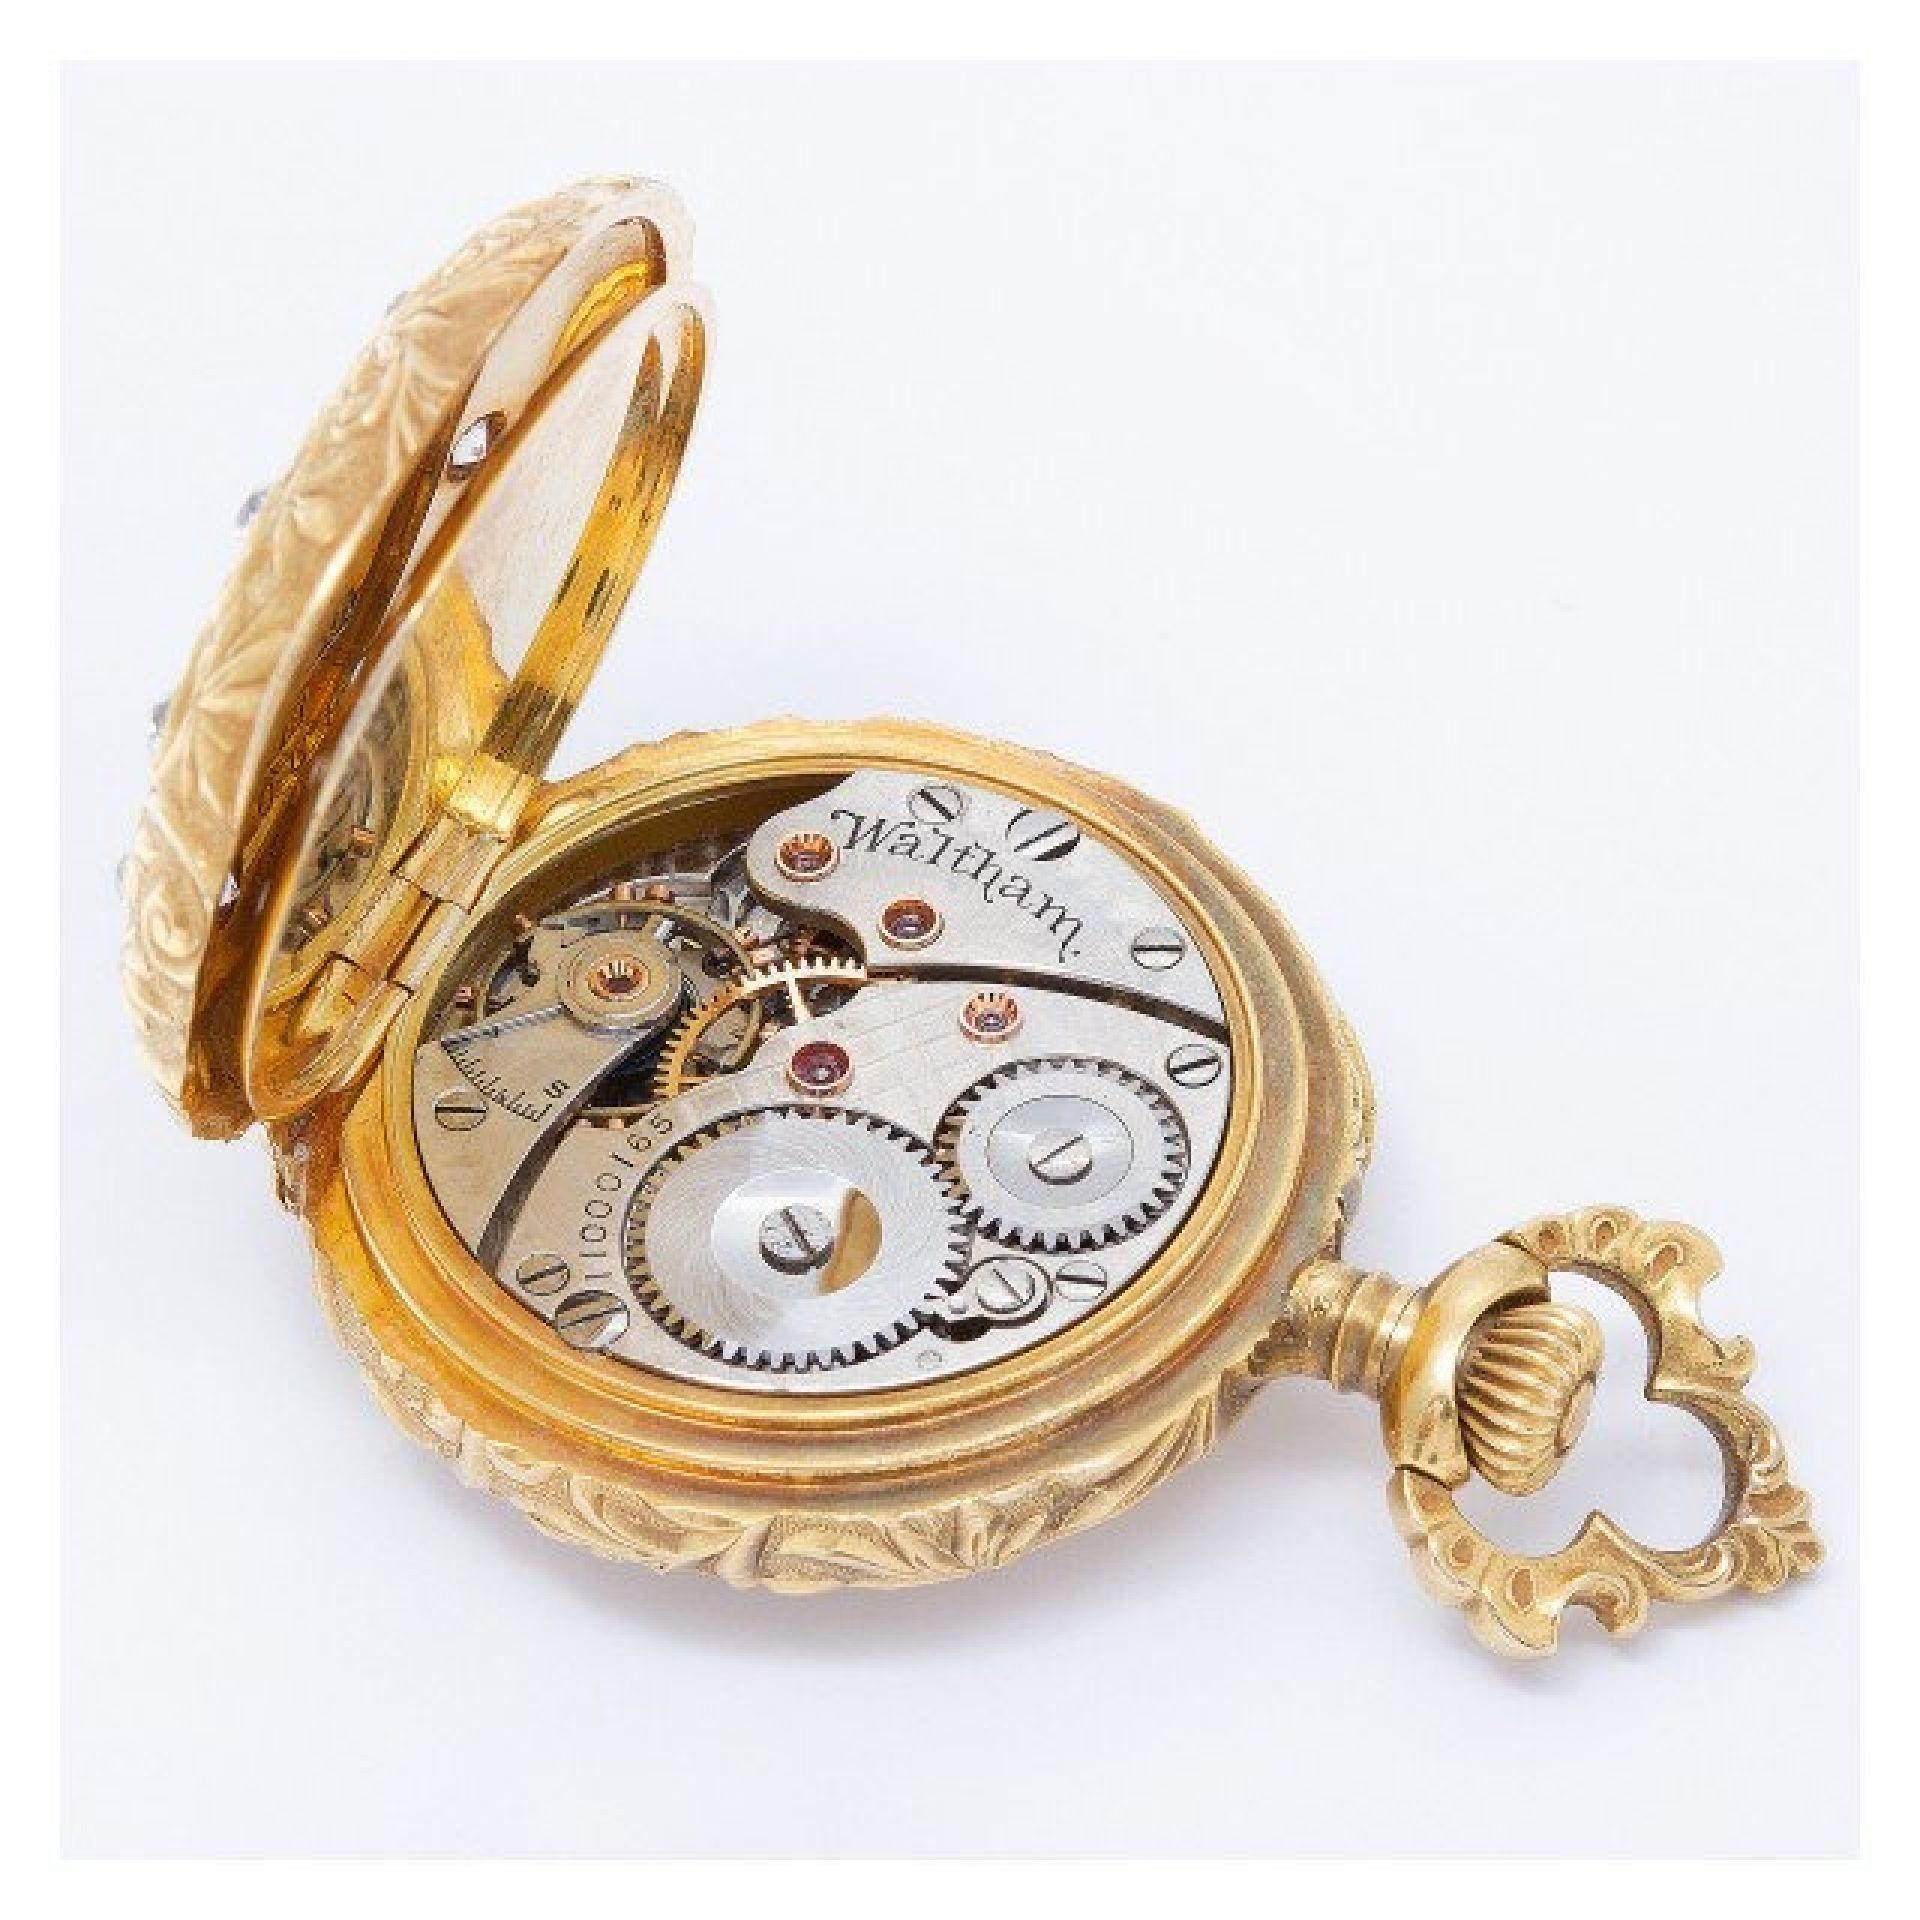 Waltham pocket watch 18k White dial 27mm Manual watch